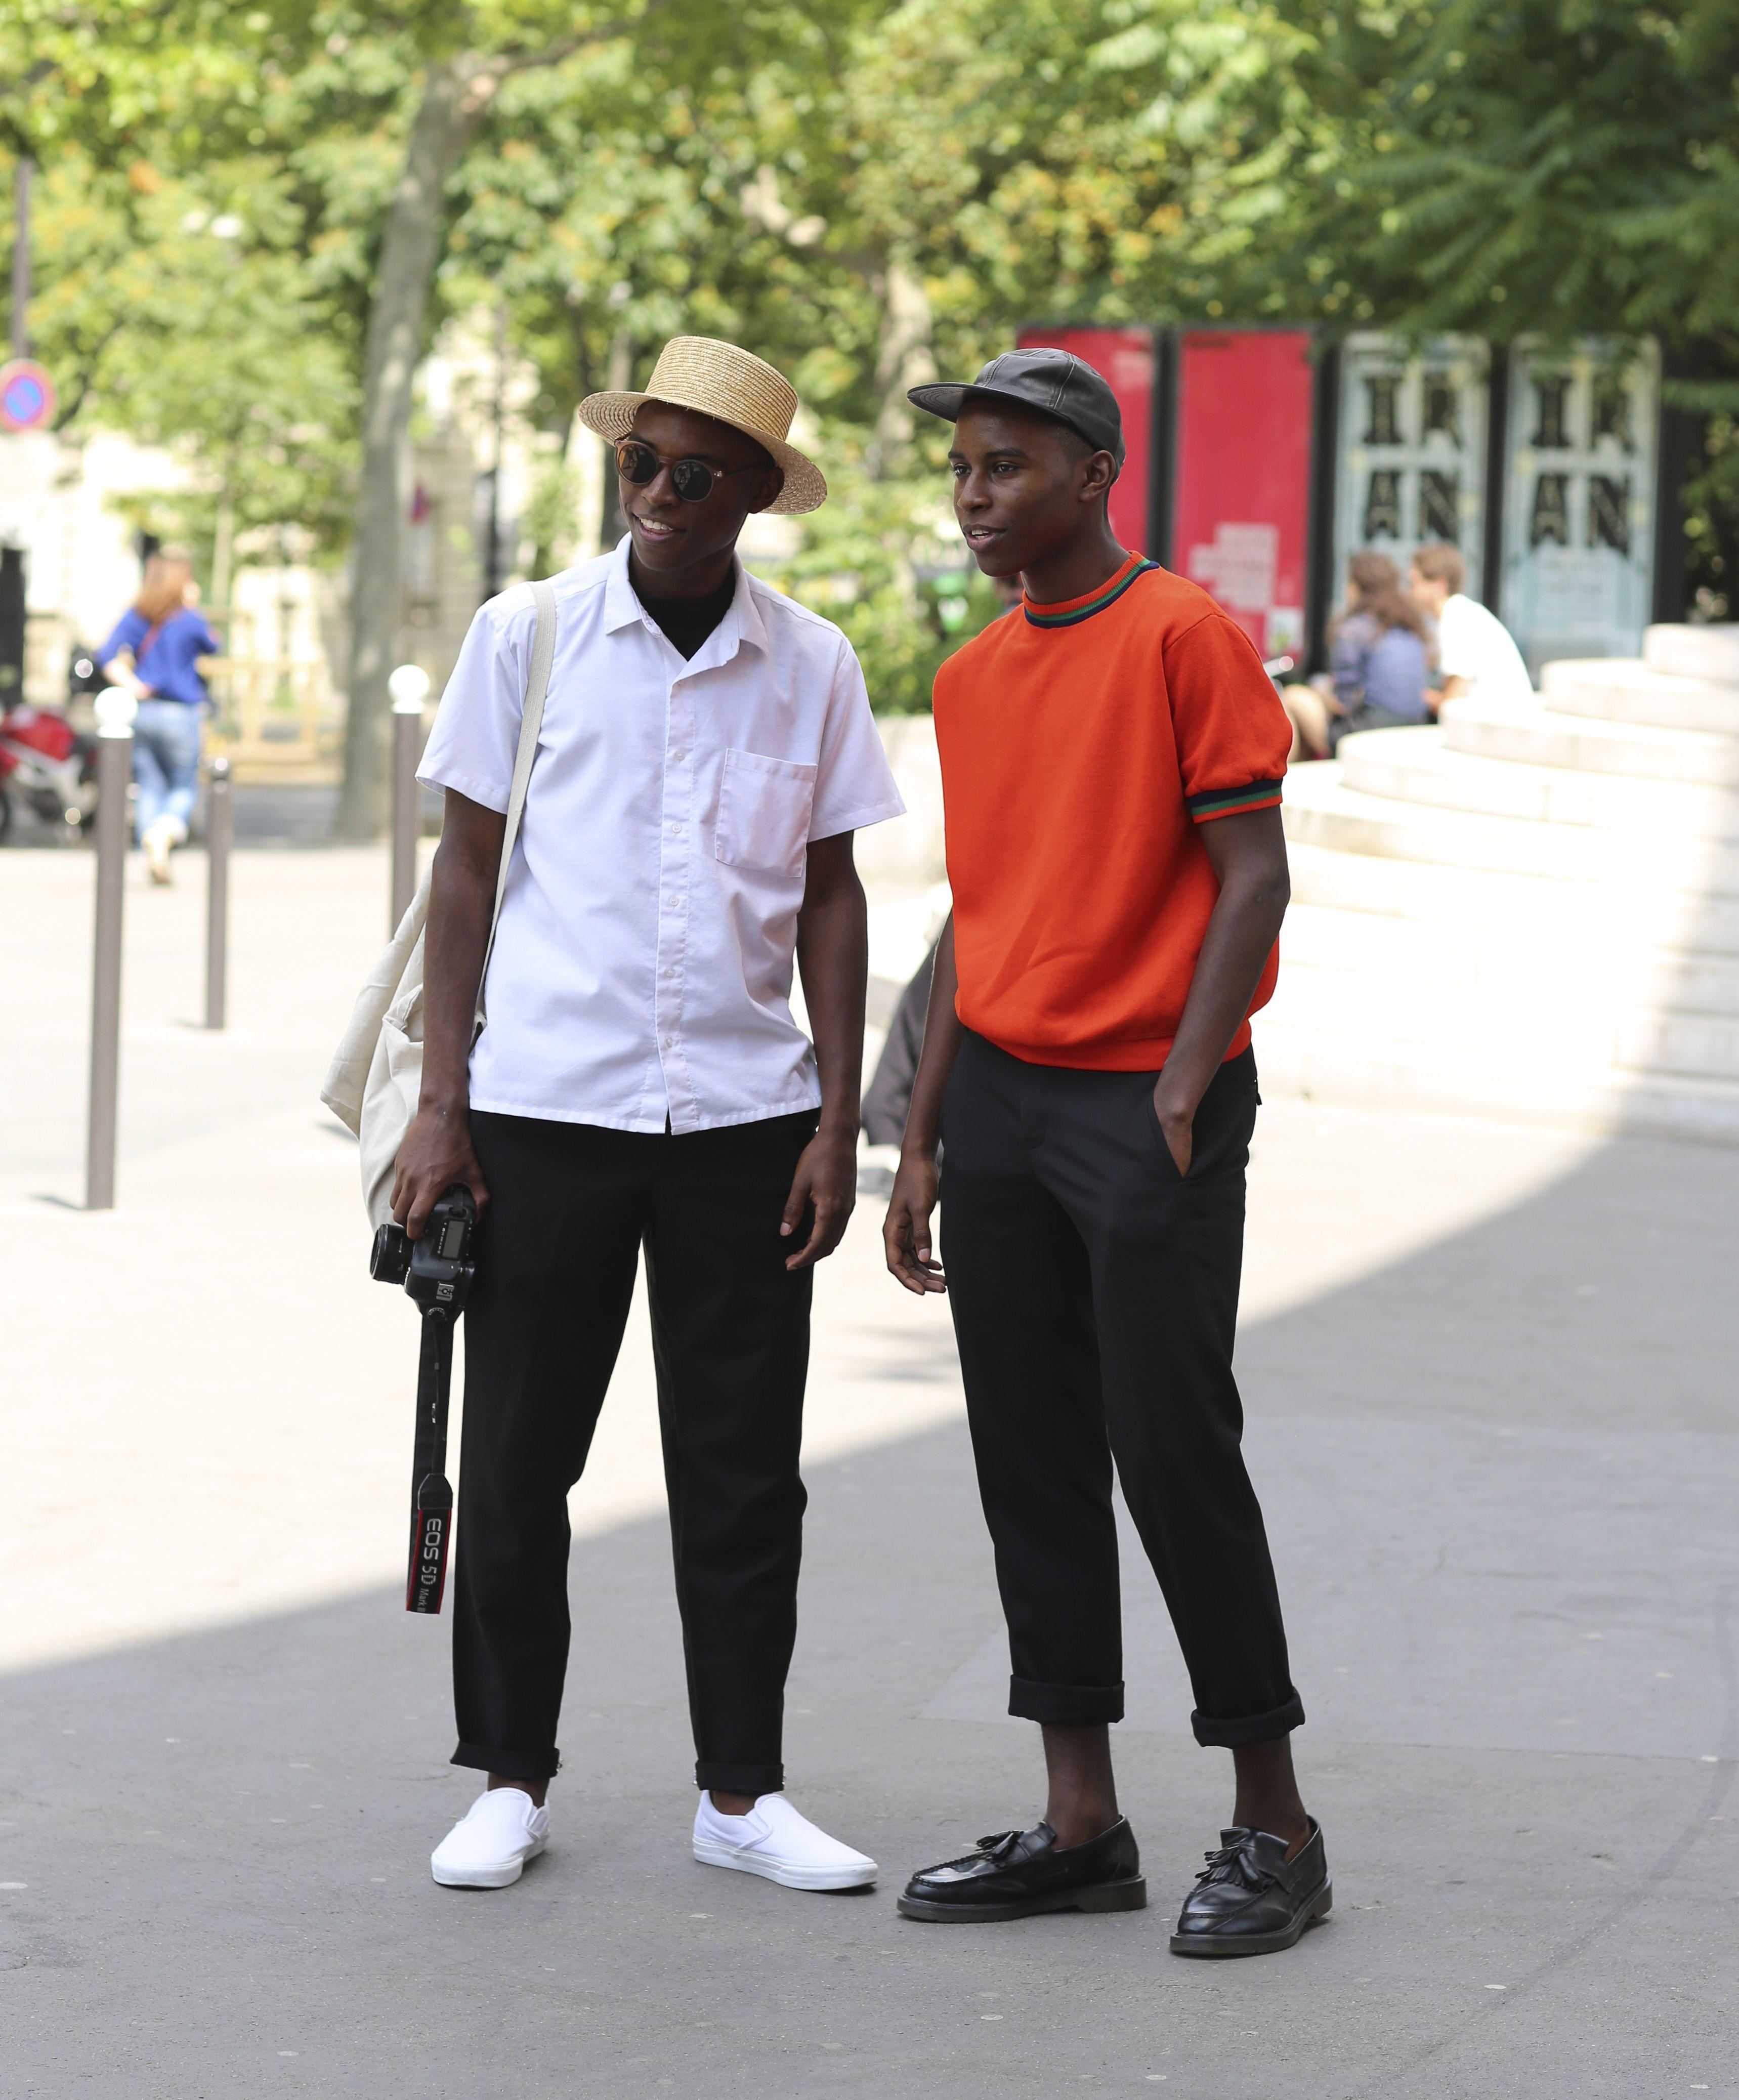 Paris Men's Fashion Week. (Photo: Lee Oliveira for The New York Times)